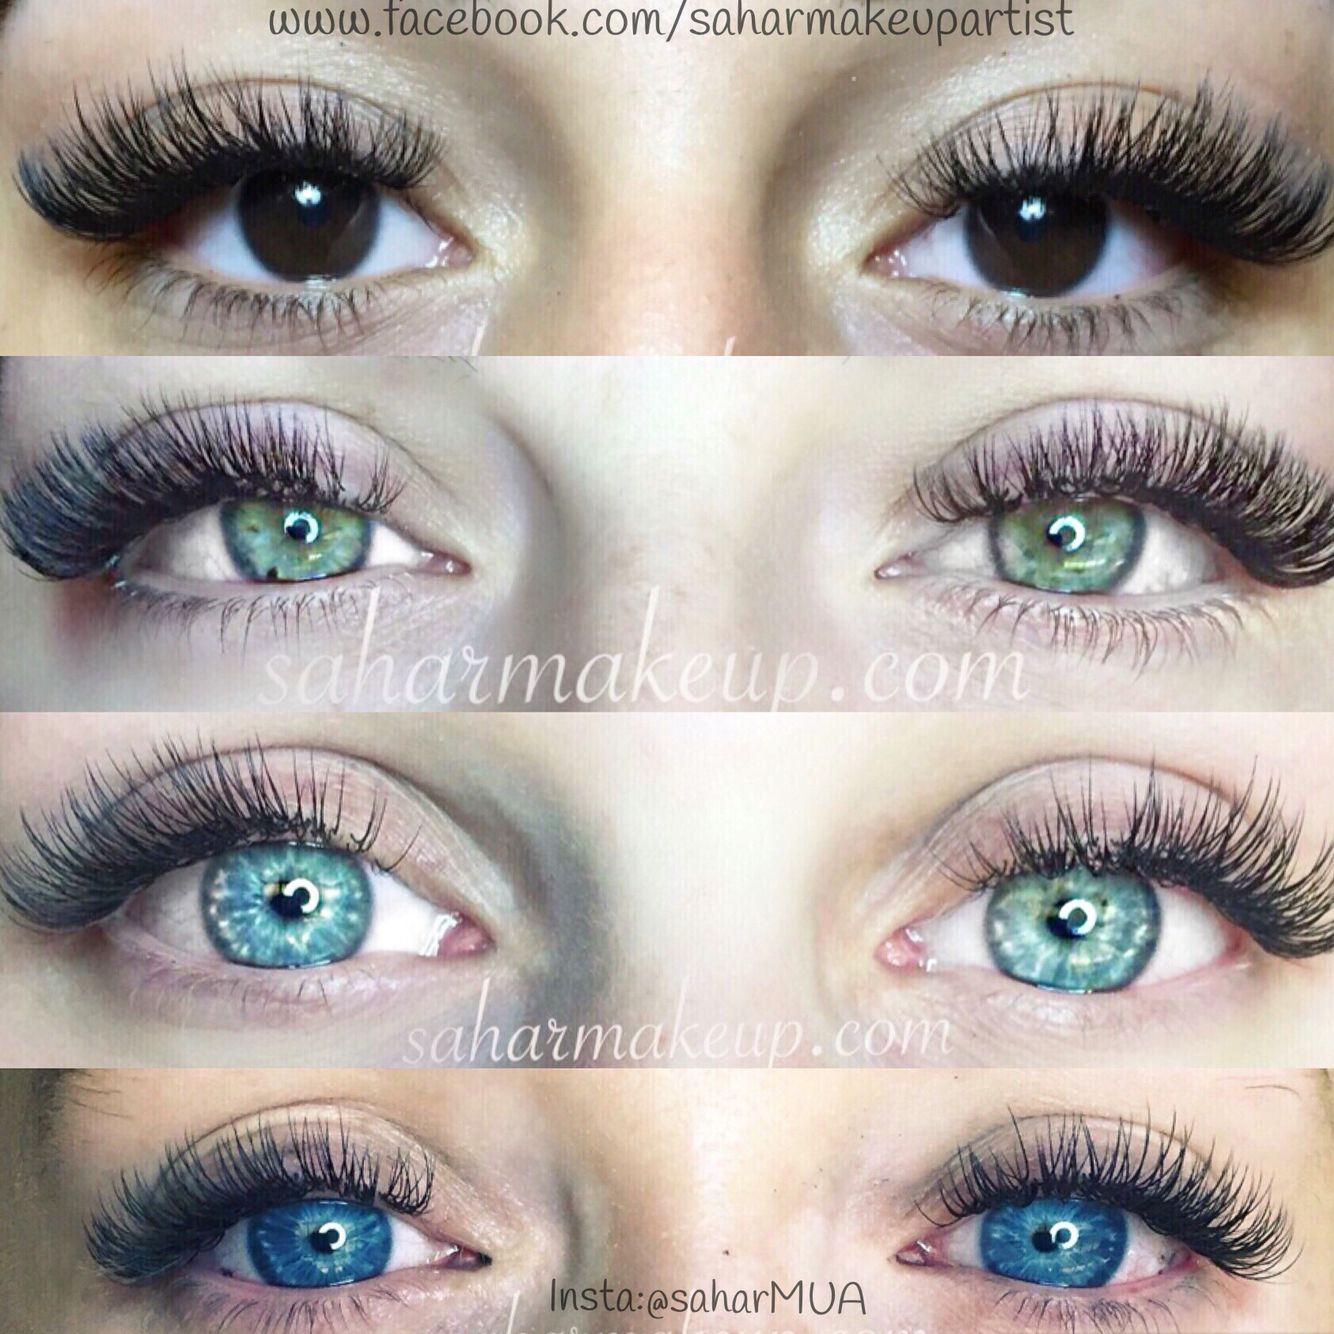 b1847ee75a5 Eyelash extensions by Sahar Makeup • Russian Volume lashes • Master Lash  Artist • Stanmore • Bushey • Edgware • Harrow • Hatchend • Northwood •  Watford ...